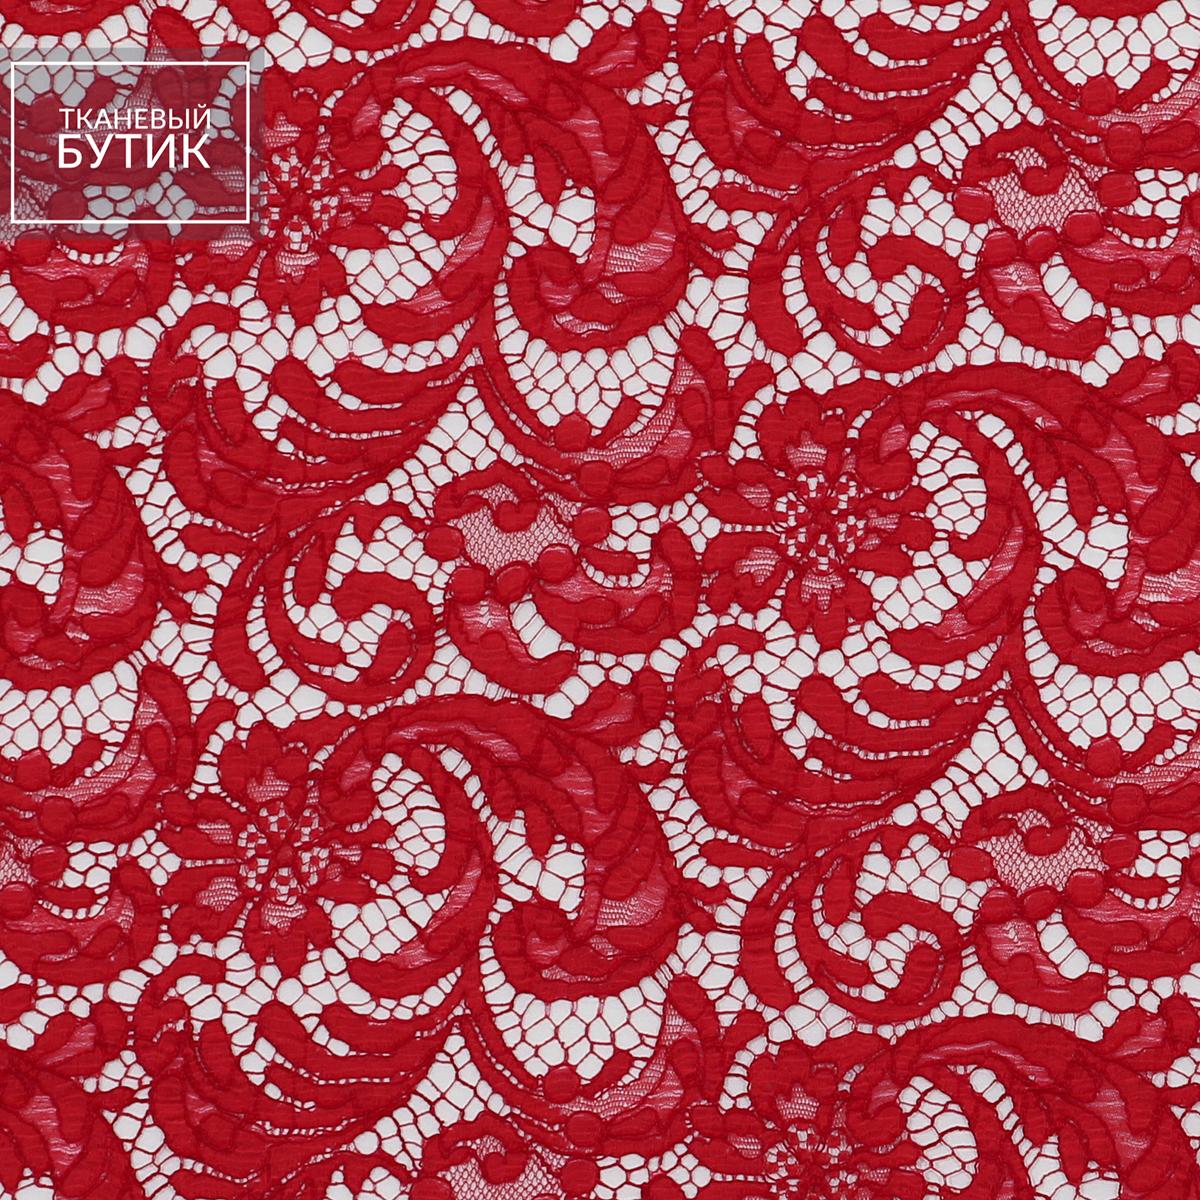 Французское кордовое кружево красного цвета